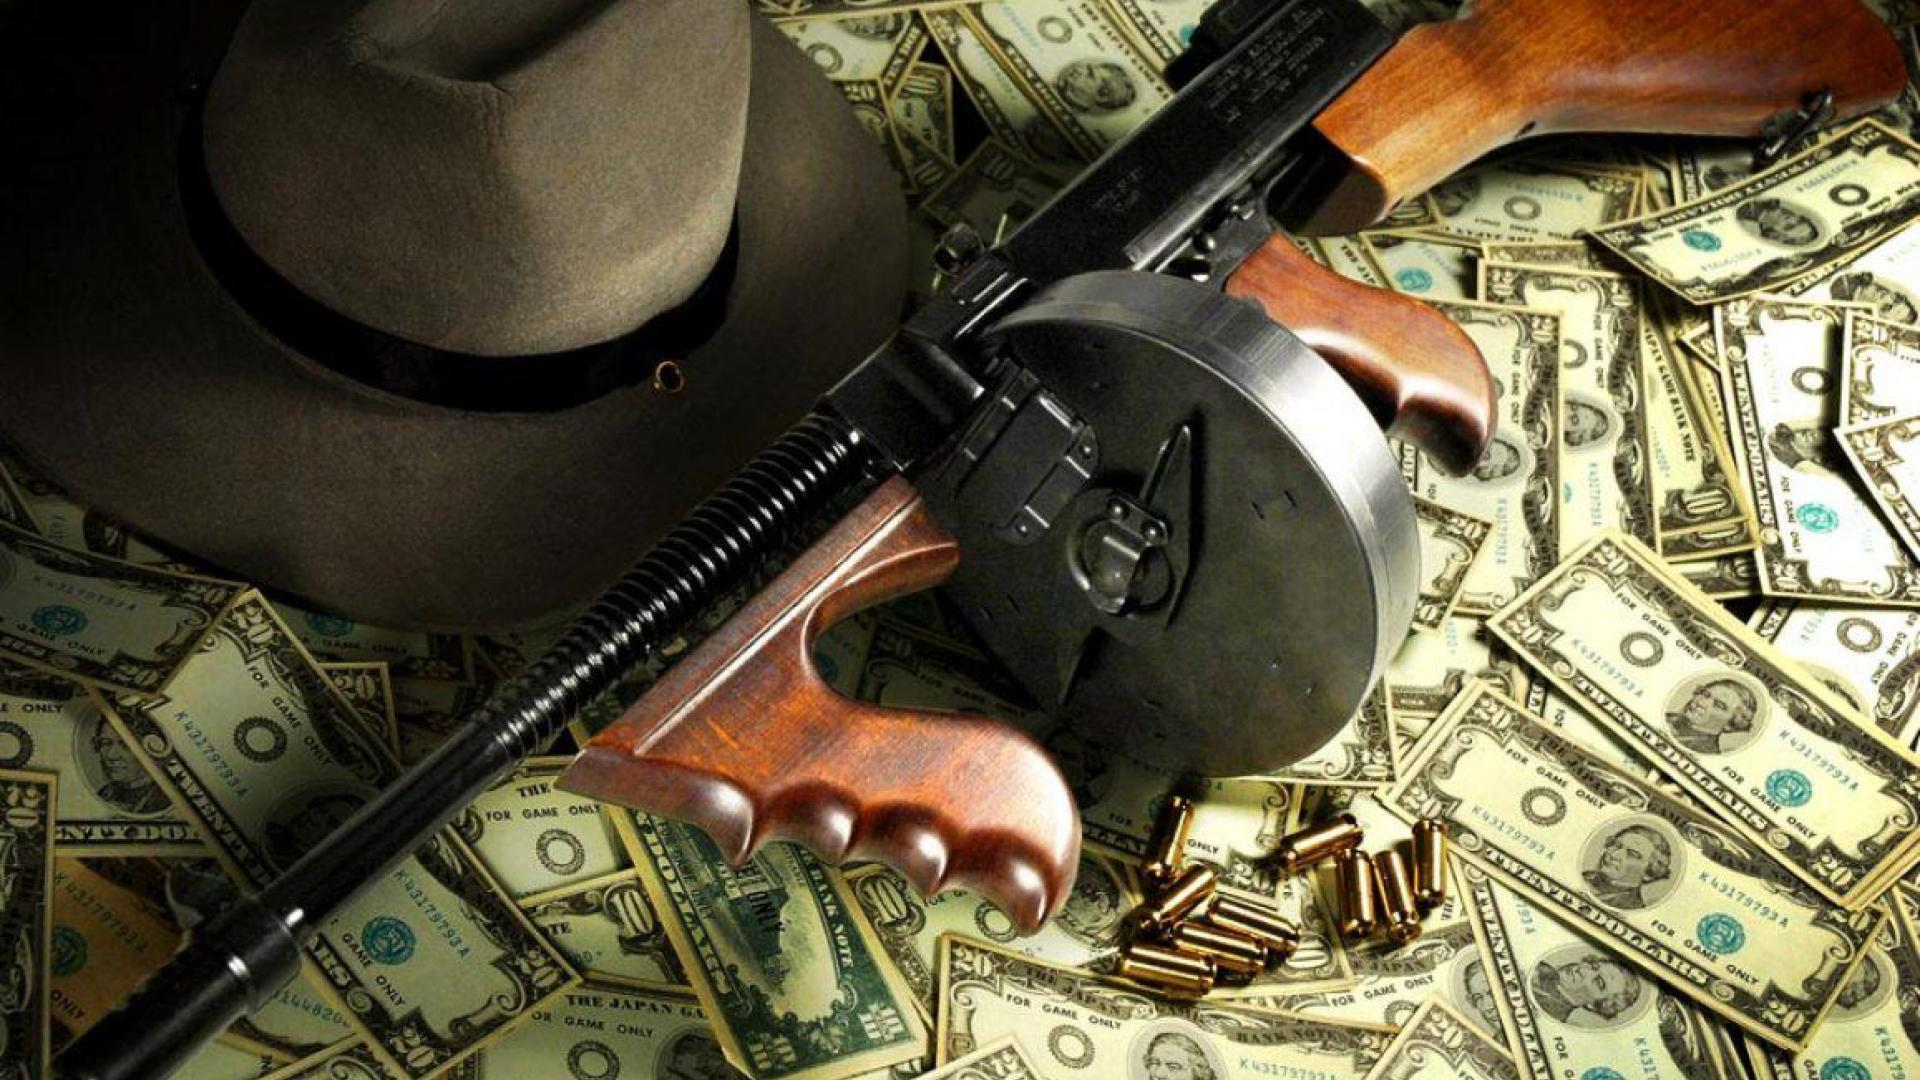 Download Wallpaper Logo Gangster - wp1915429  Trends_662391.jpg